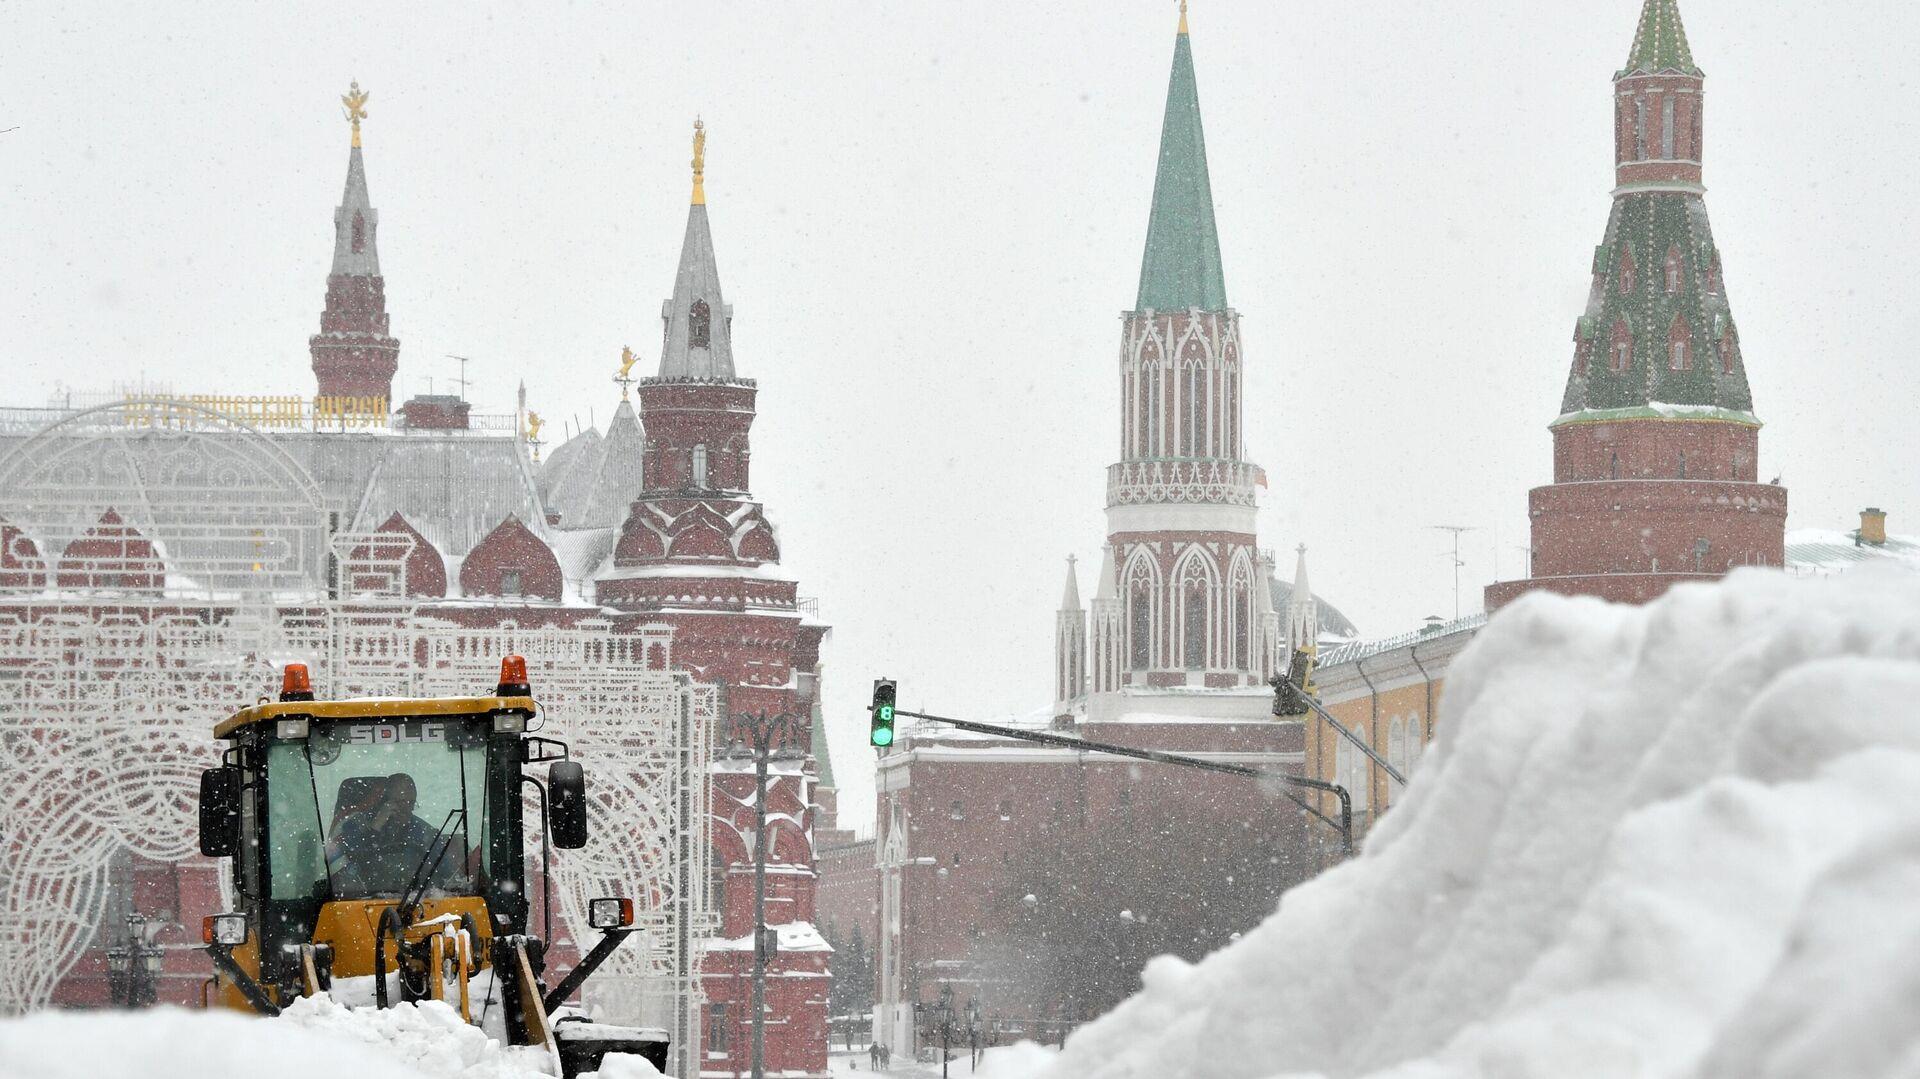 Una fuerte nevada en Moscú, Rusia - Sputnik Mundo, 1920, 13.02.2021